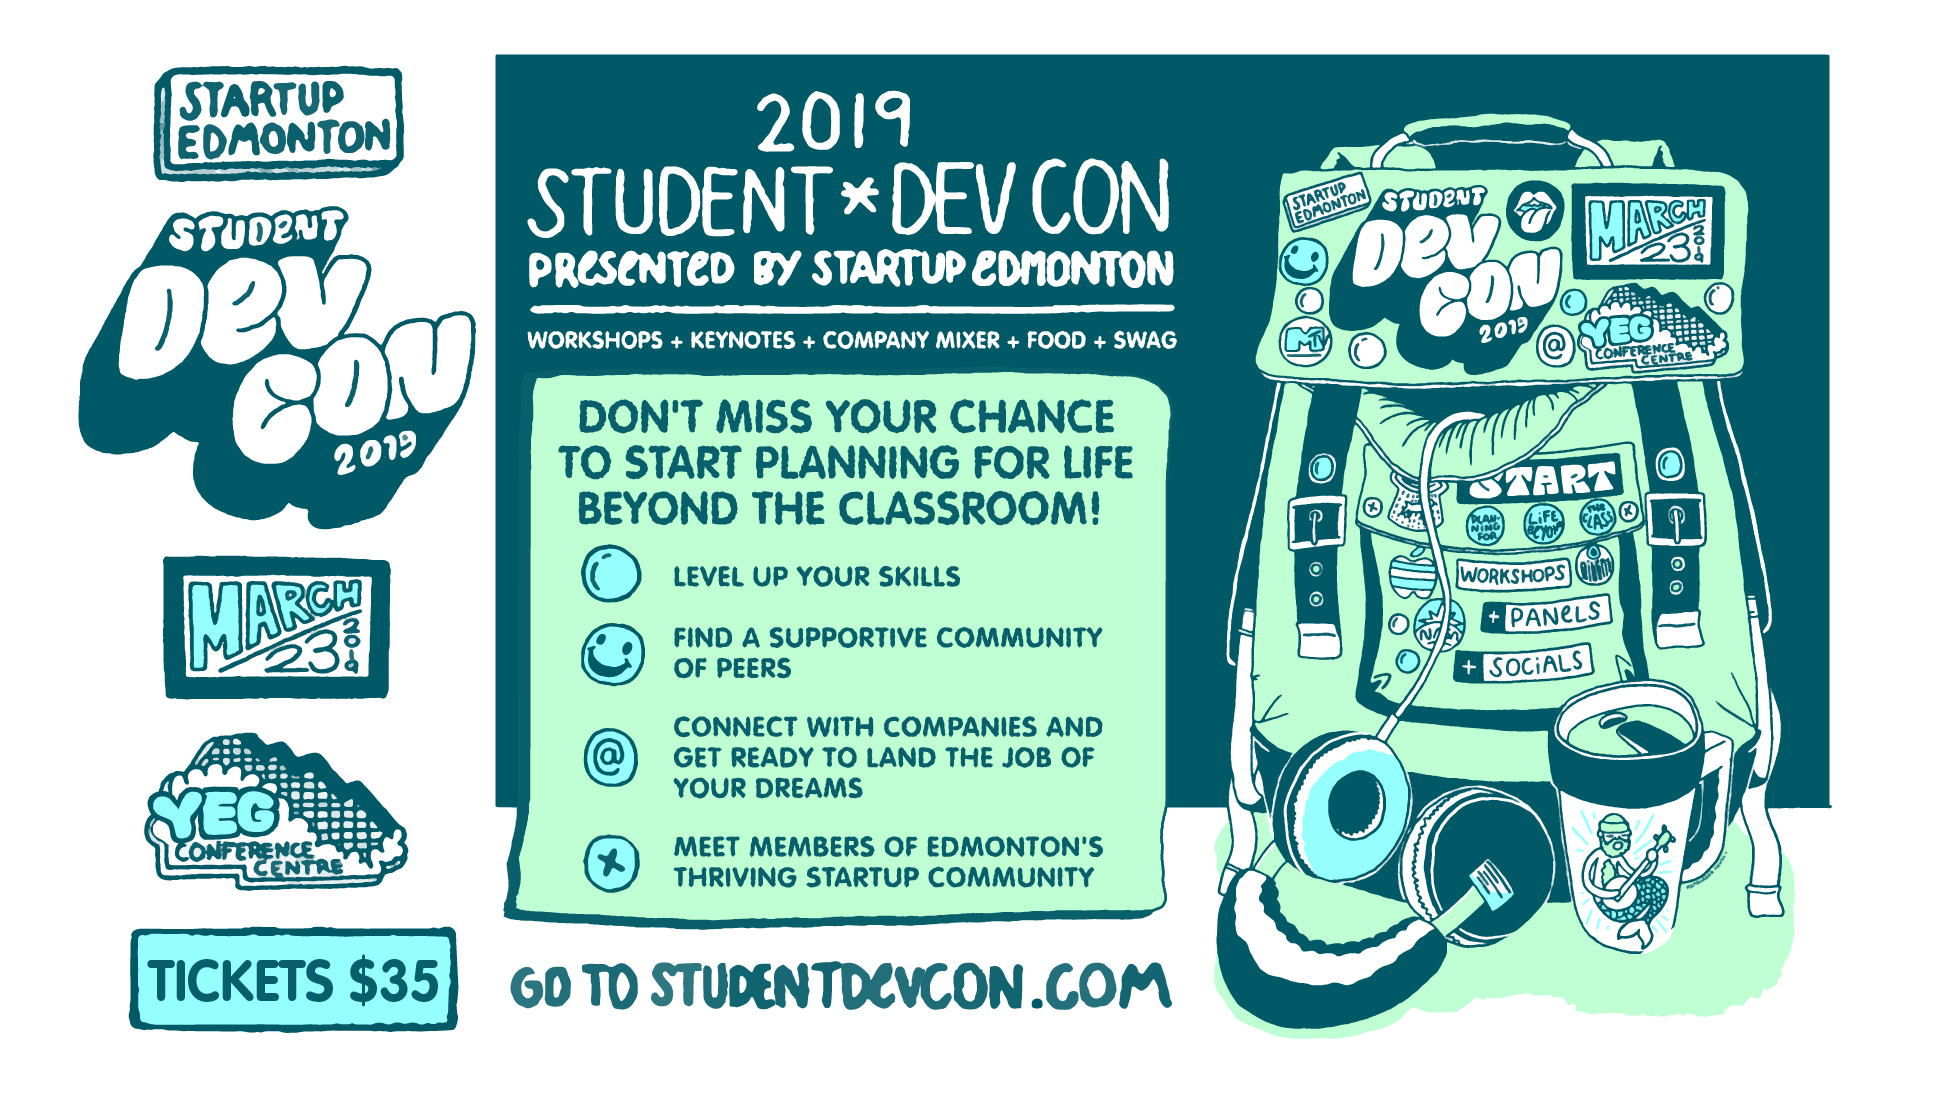 Student DevCon 2019 - Promo PPT-01.jpg